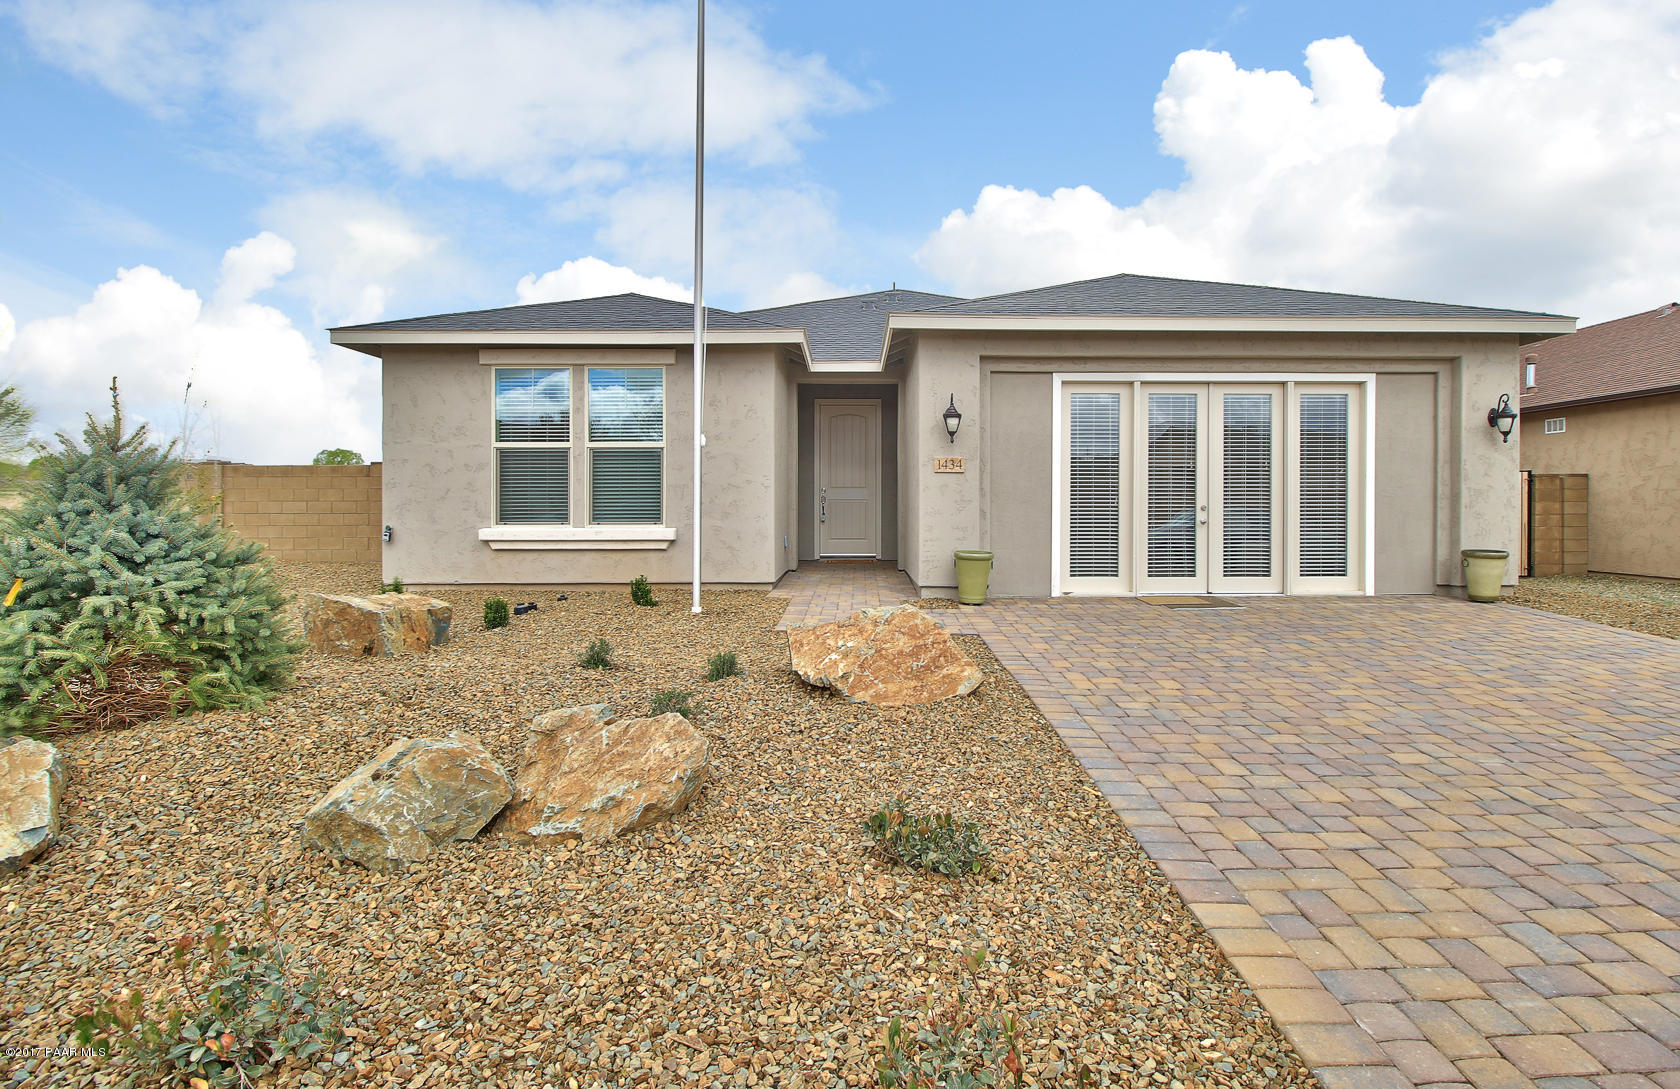 Photo of 1216 Bainbridge, Chino Valley, AZ 86323